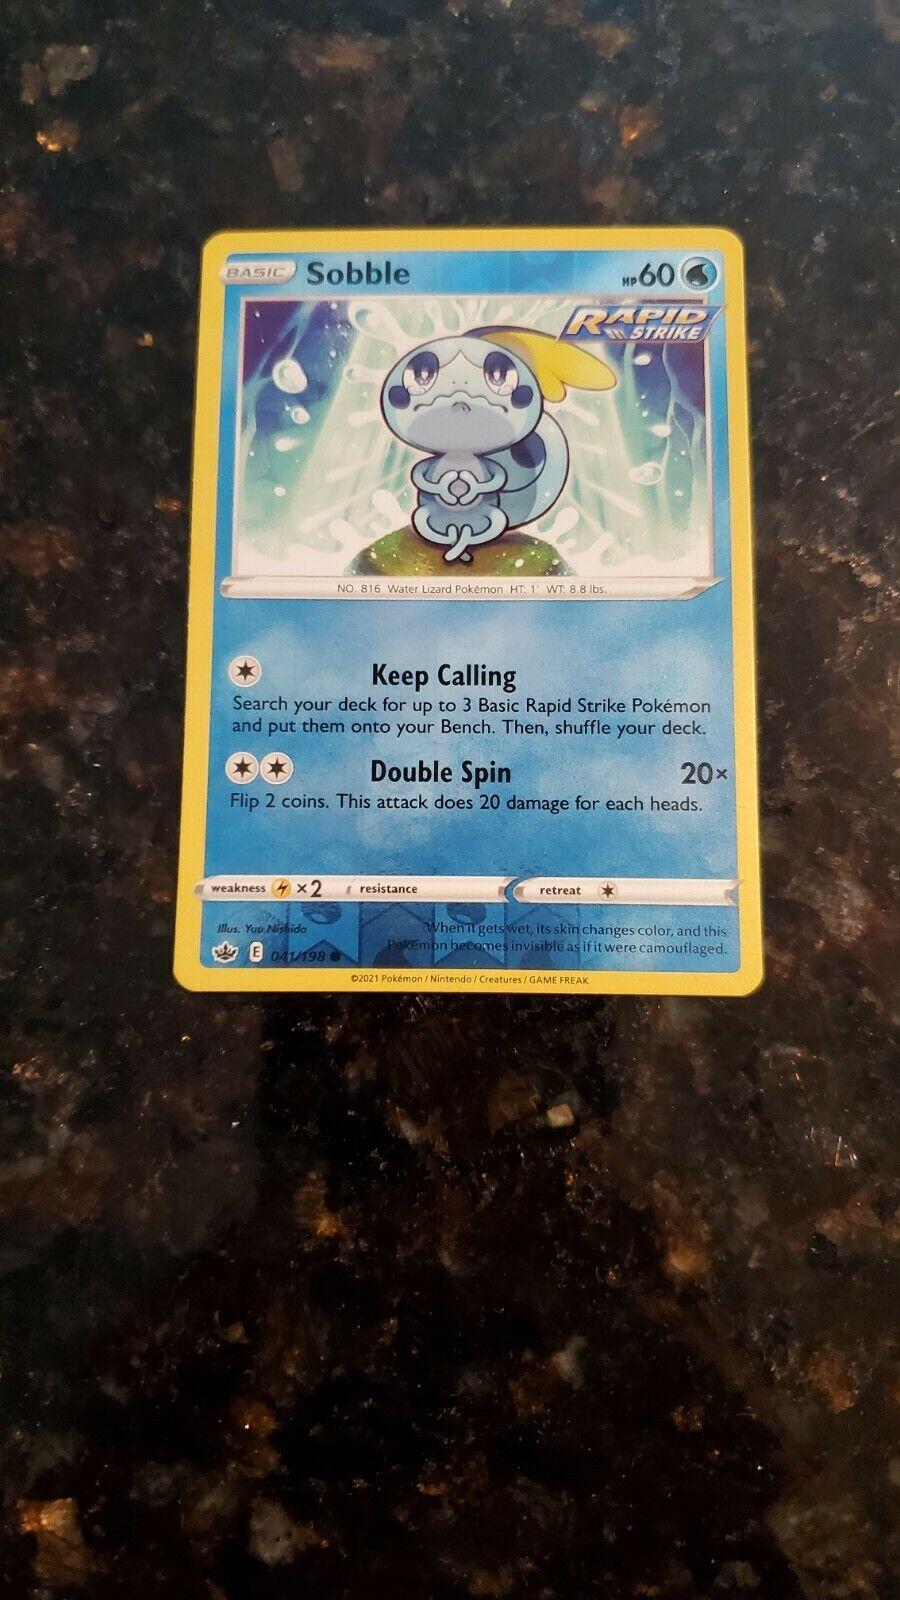 Pokemon Card Chilling Reign - *Sobble* 041/198 Reverse Holo Foil - NM